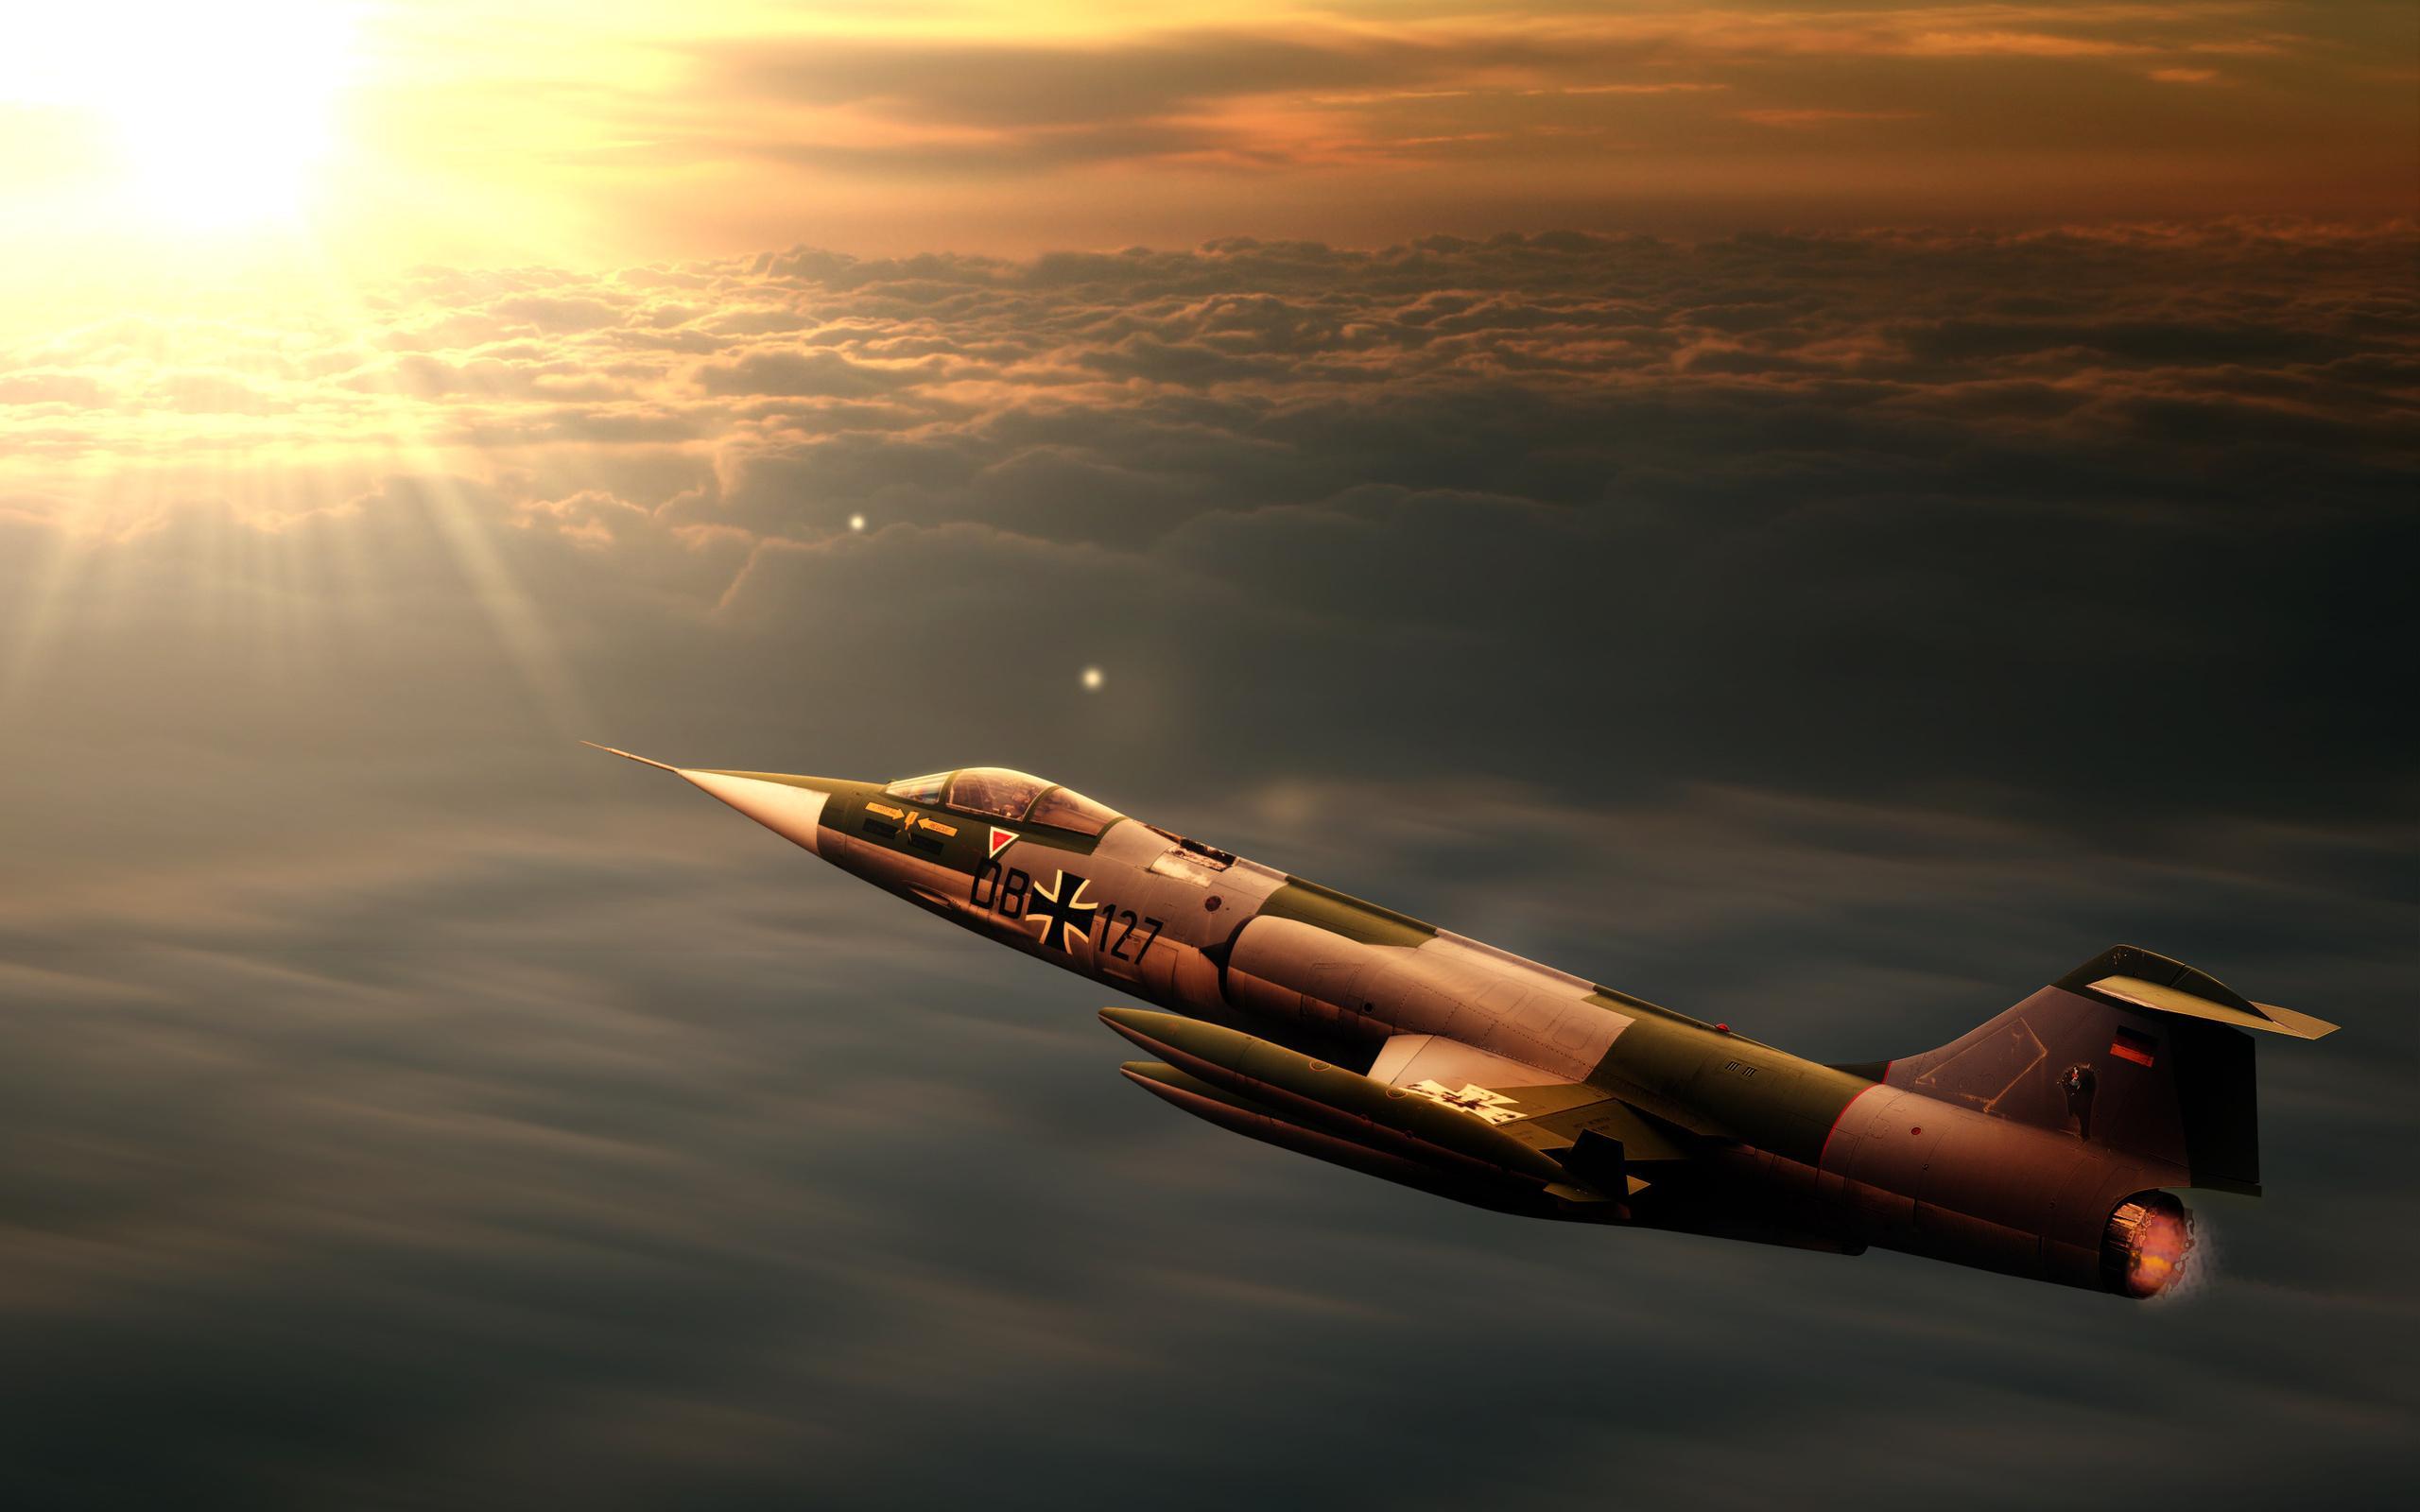 Lockheed F-104 Starfighter wallpapers HD quality